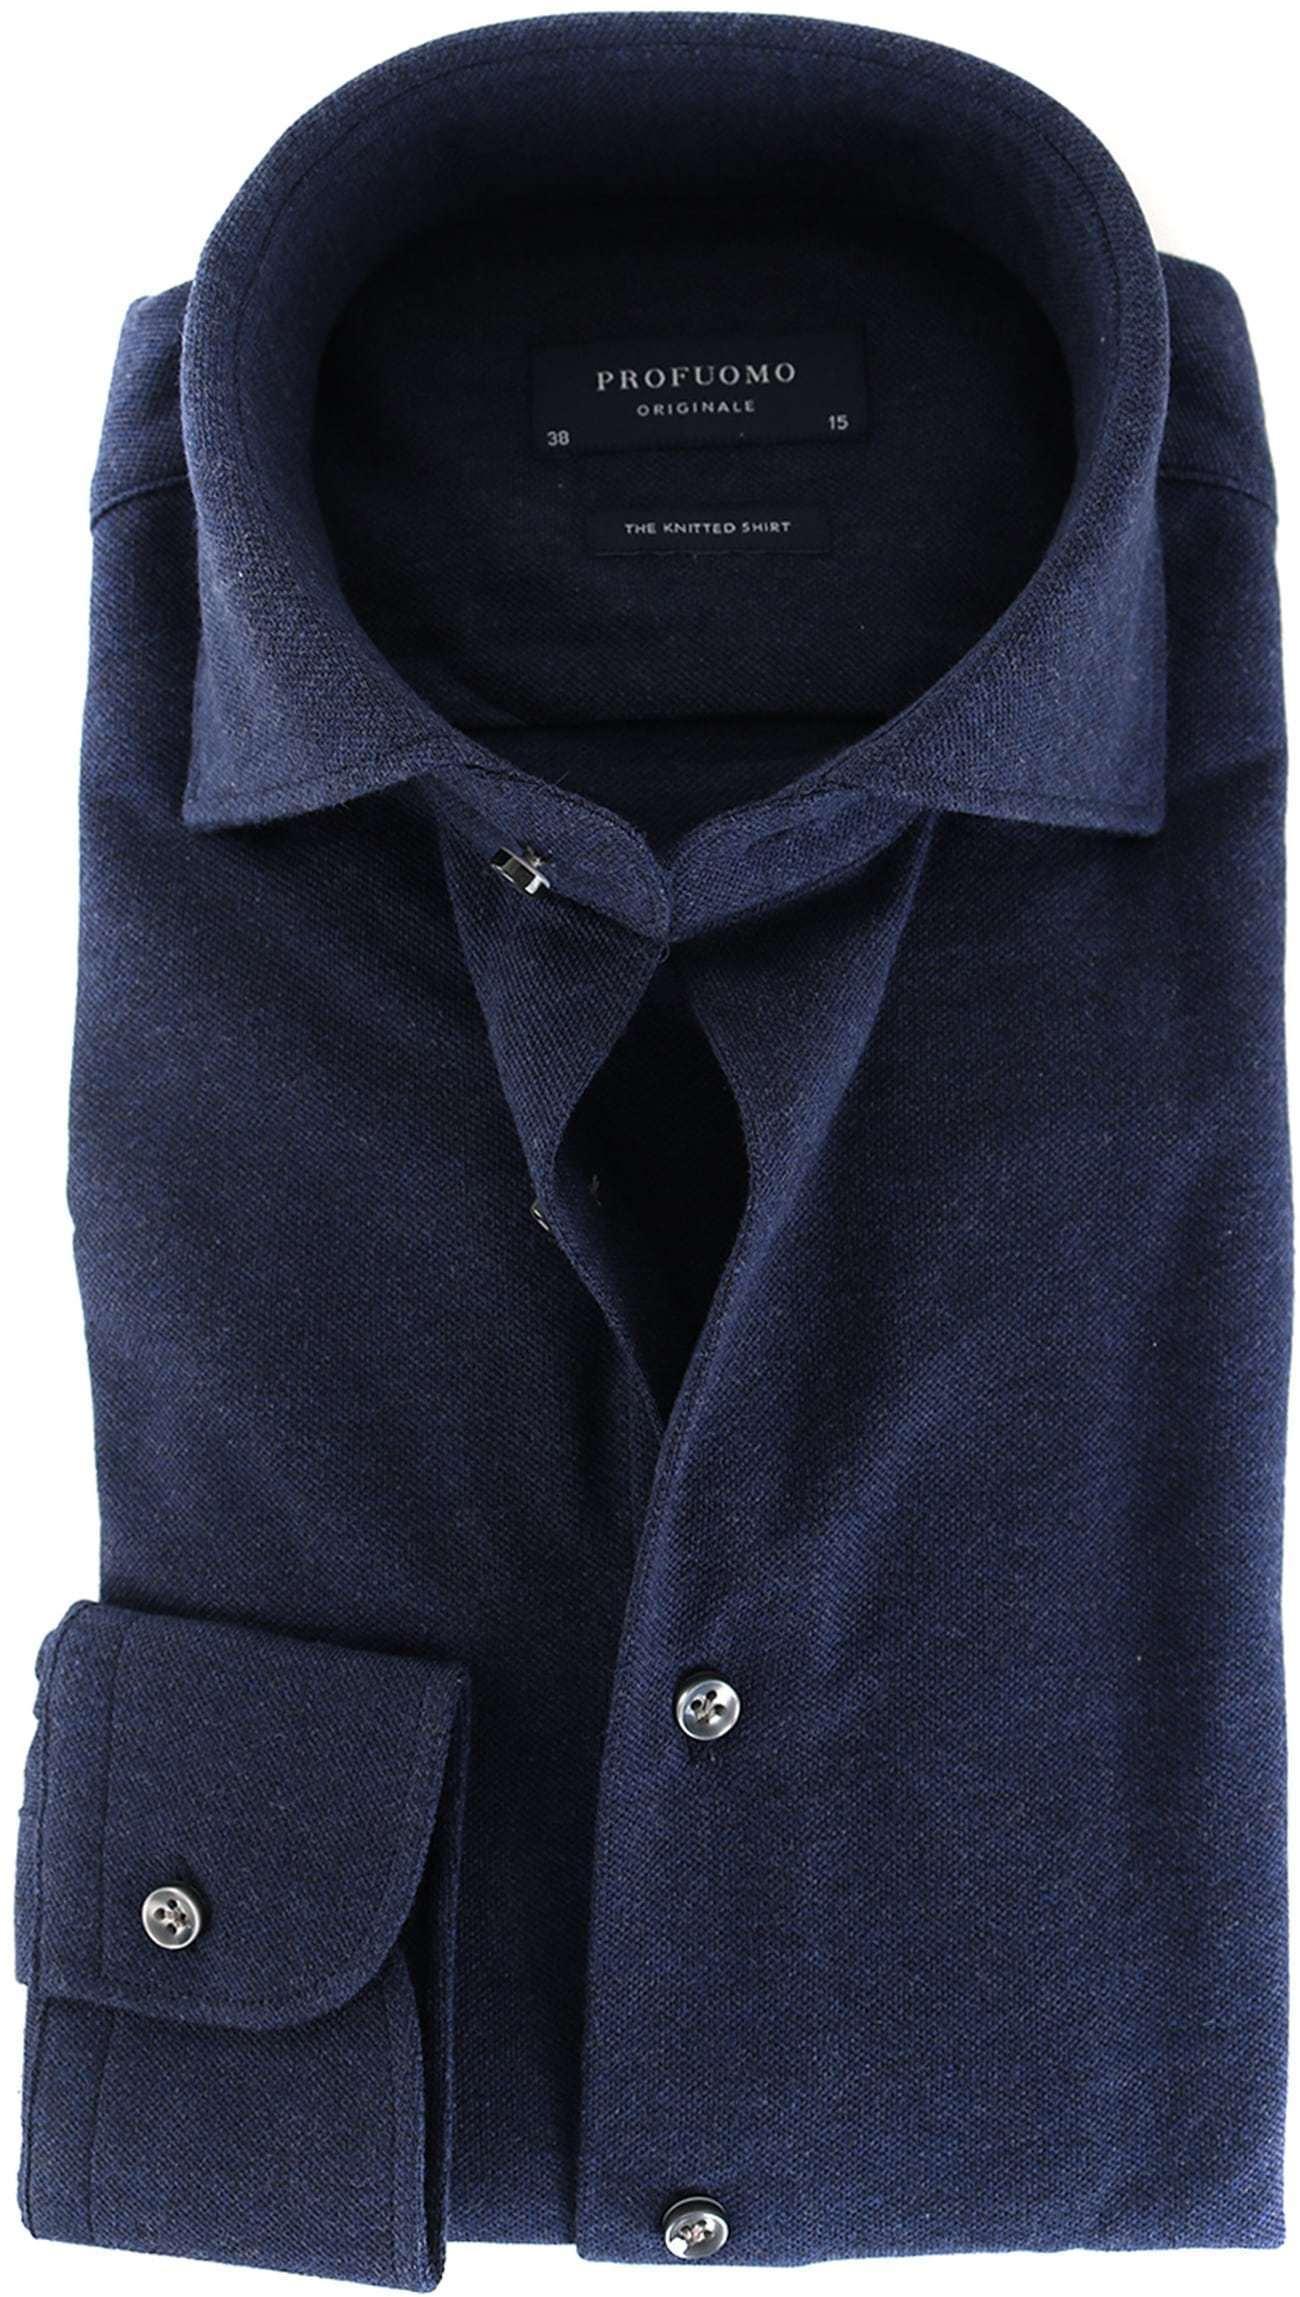 Profuomo Shirt Knitted Dark Blue foto 0